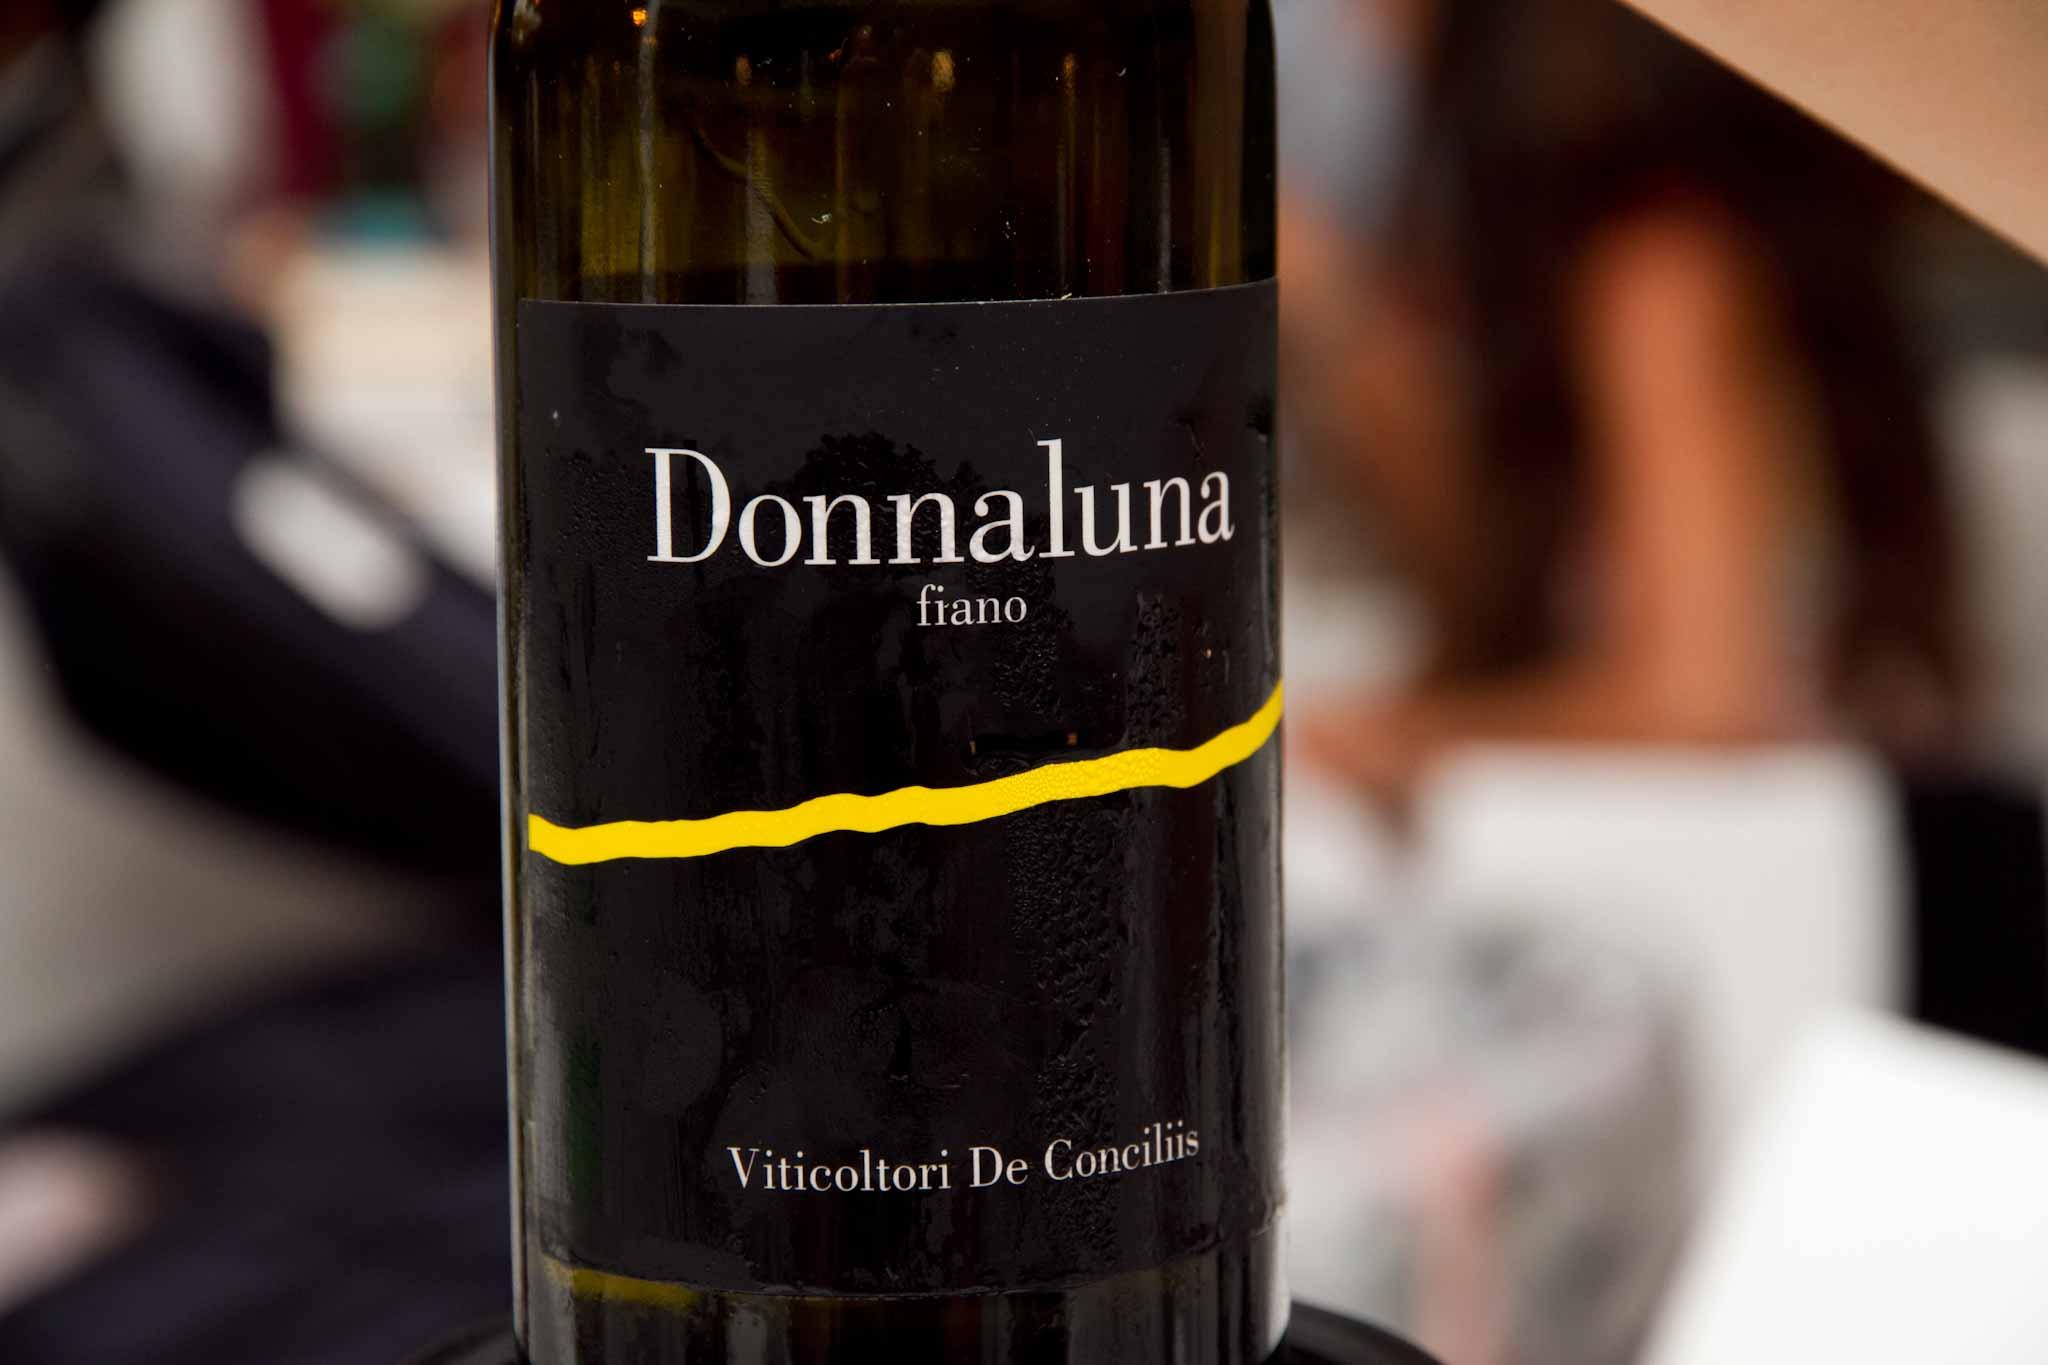 fiano Donnaluna De Conciliis